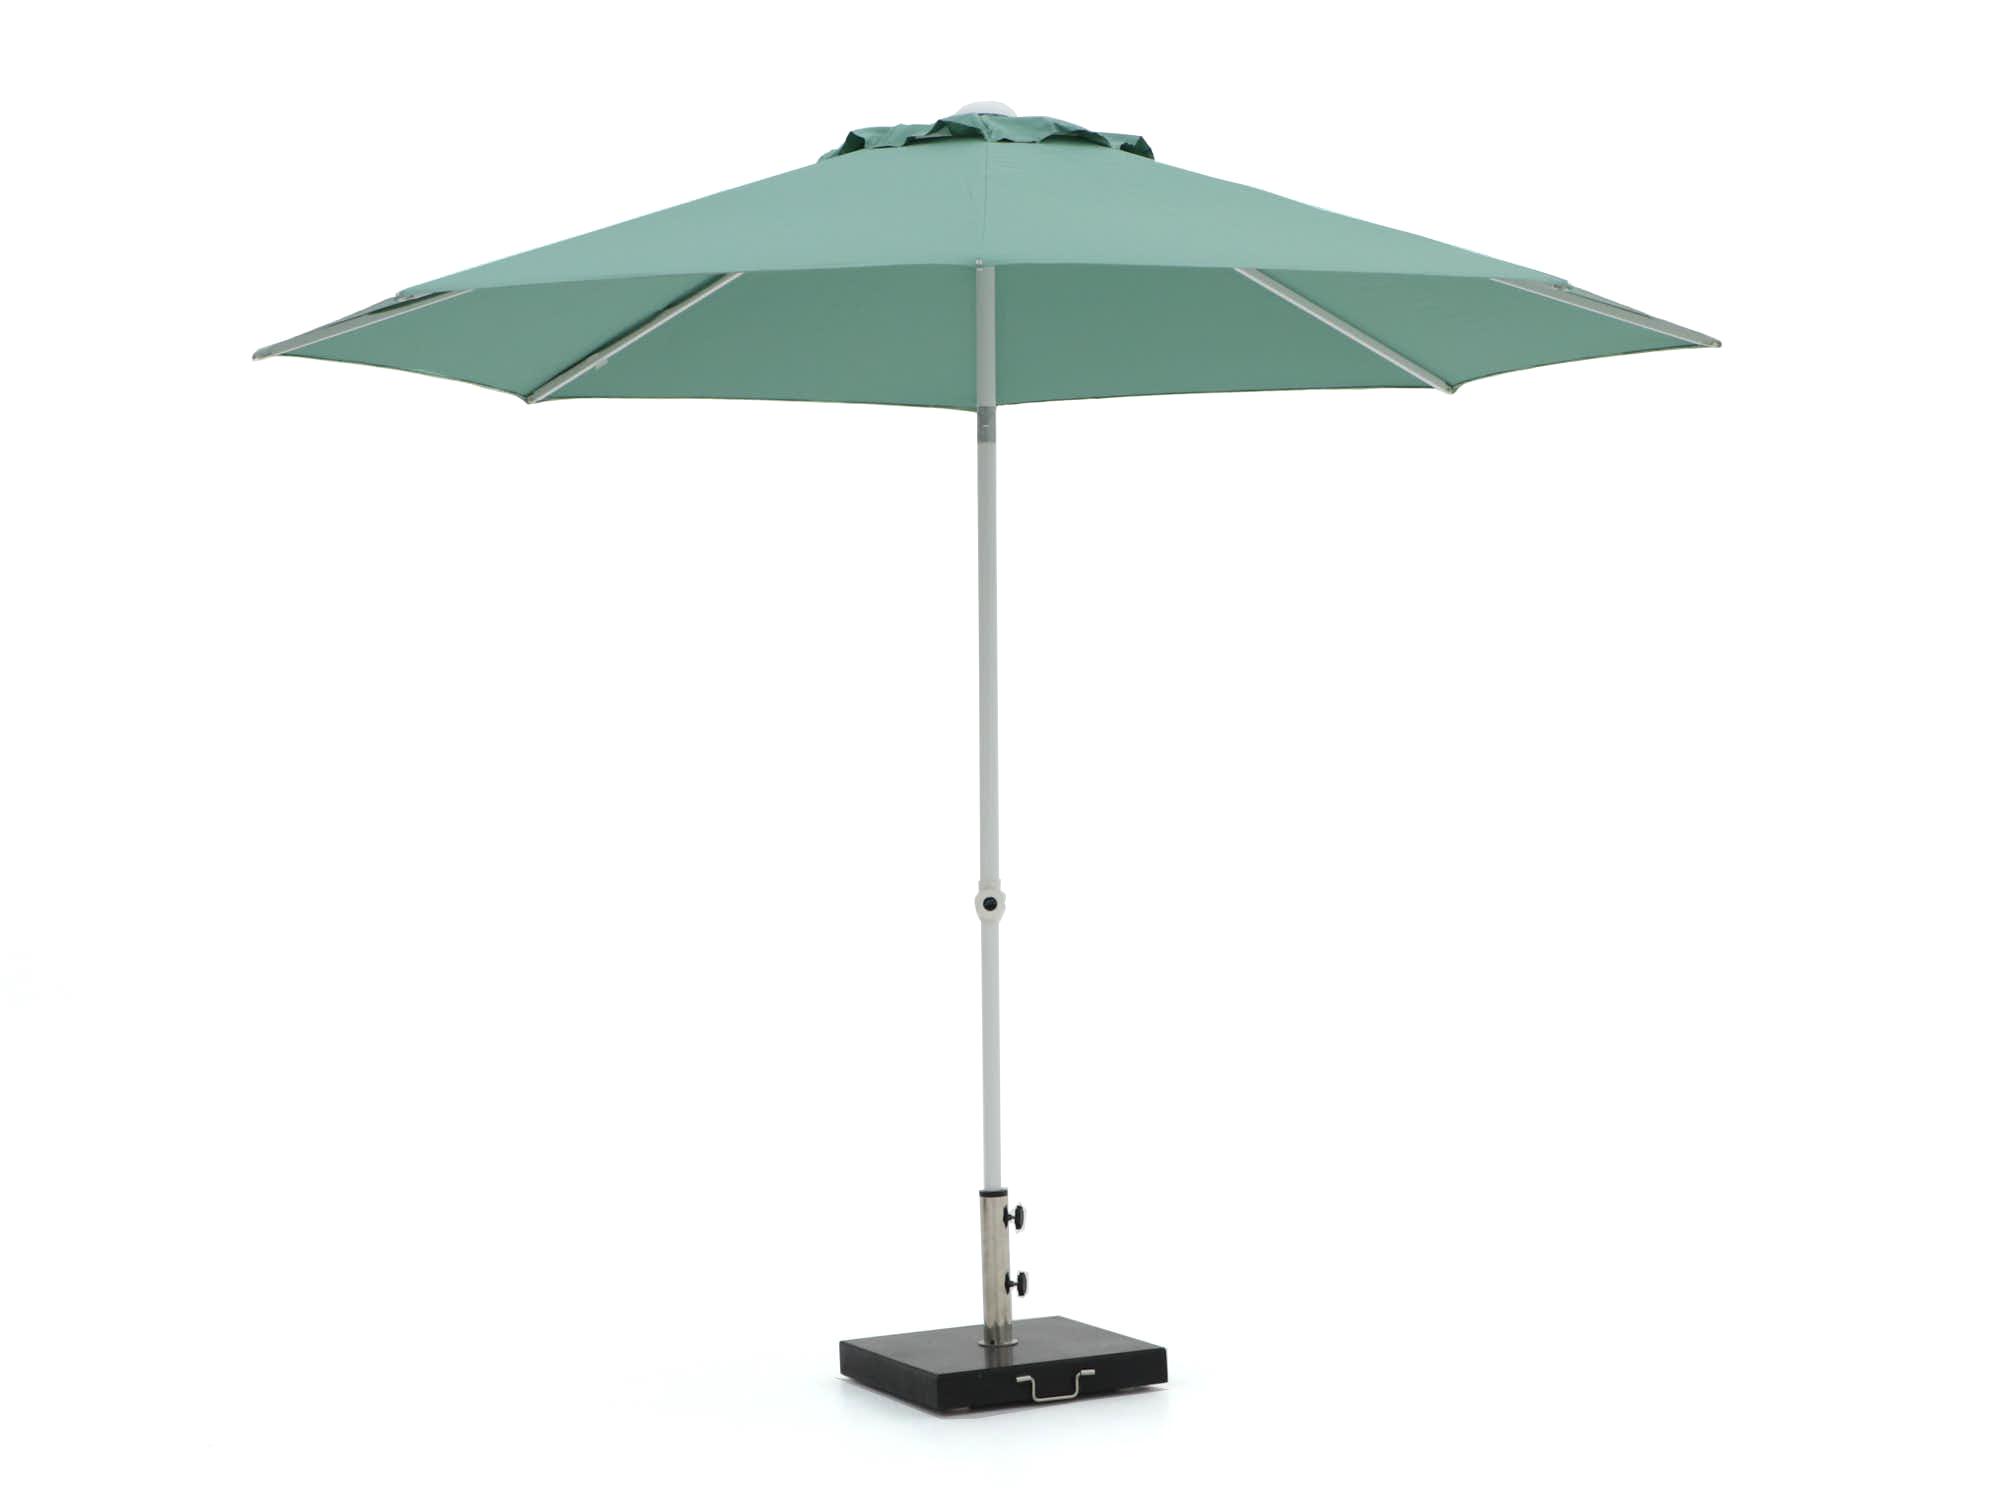 Shadowline Push-up parasol Ø 300cm - Laagste prijsgarantie!